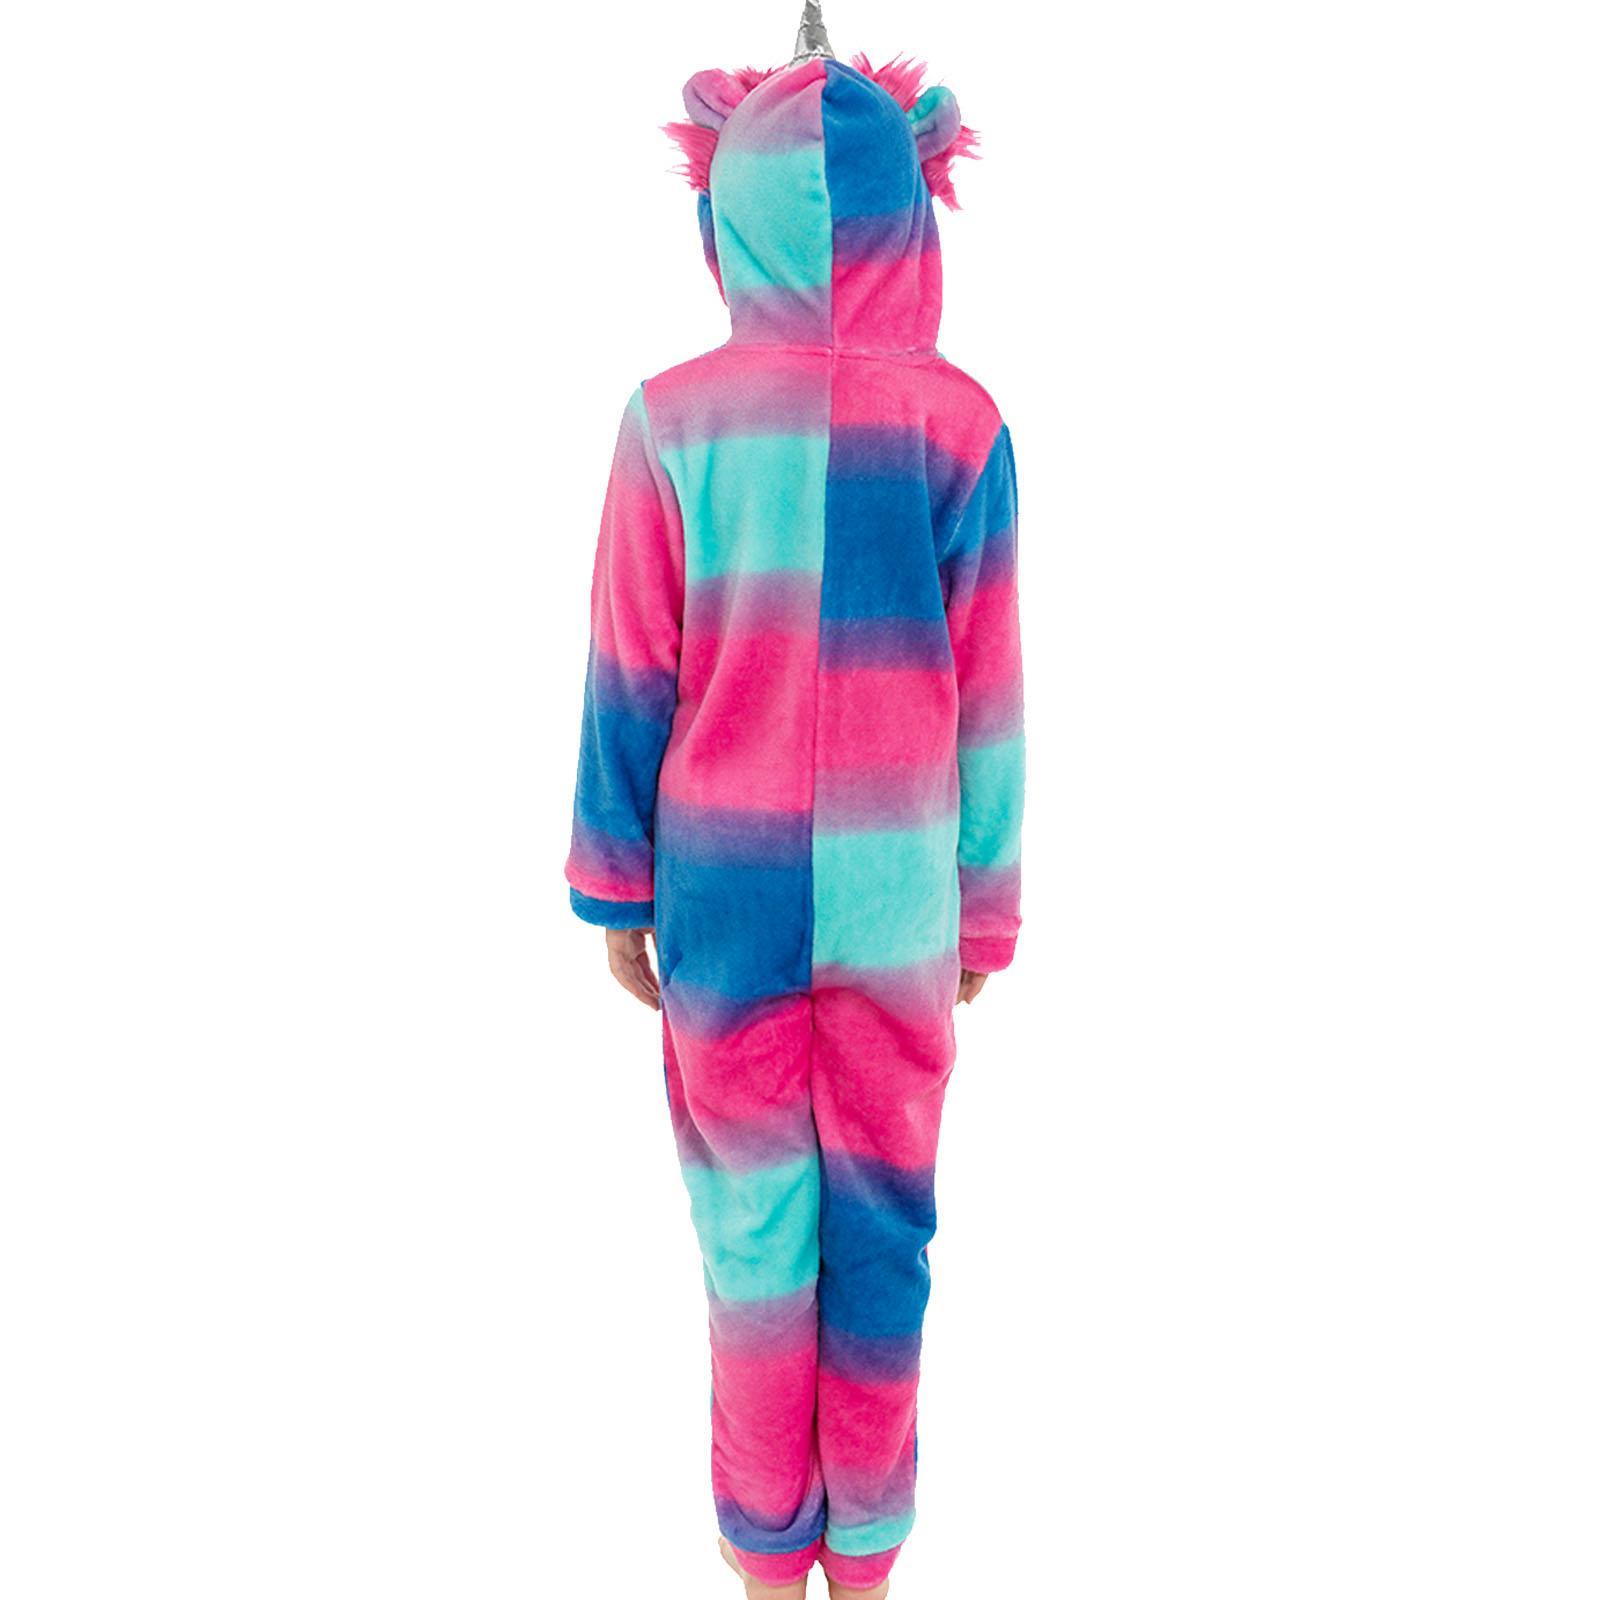 Kids Unicorn Hooded Shimmer Fleece 1Onesie Boys Girls Zip Up Jumpsuit All In One